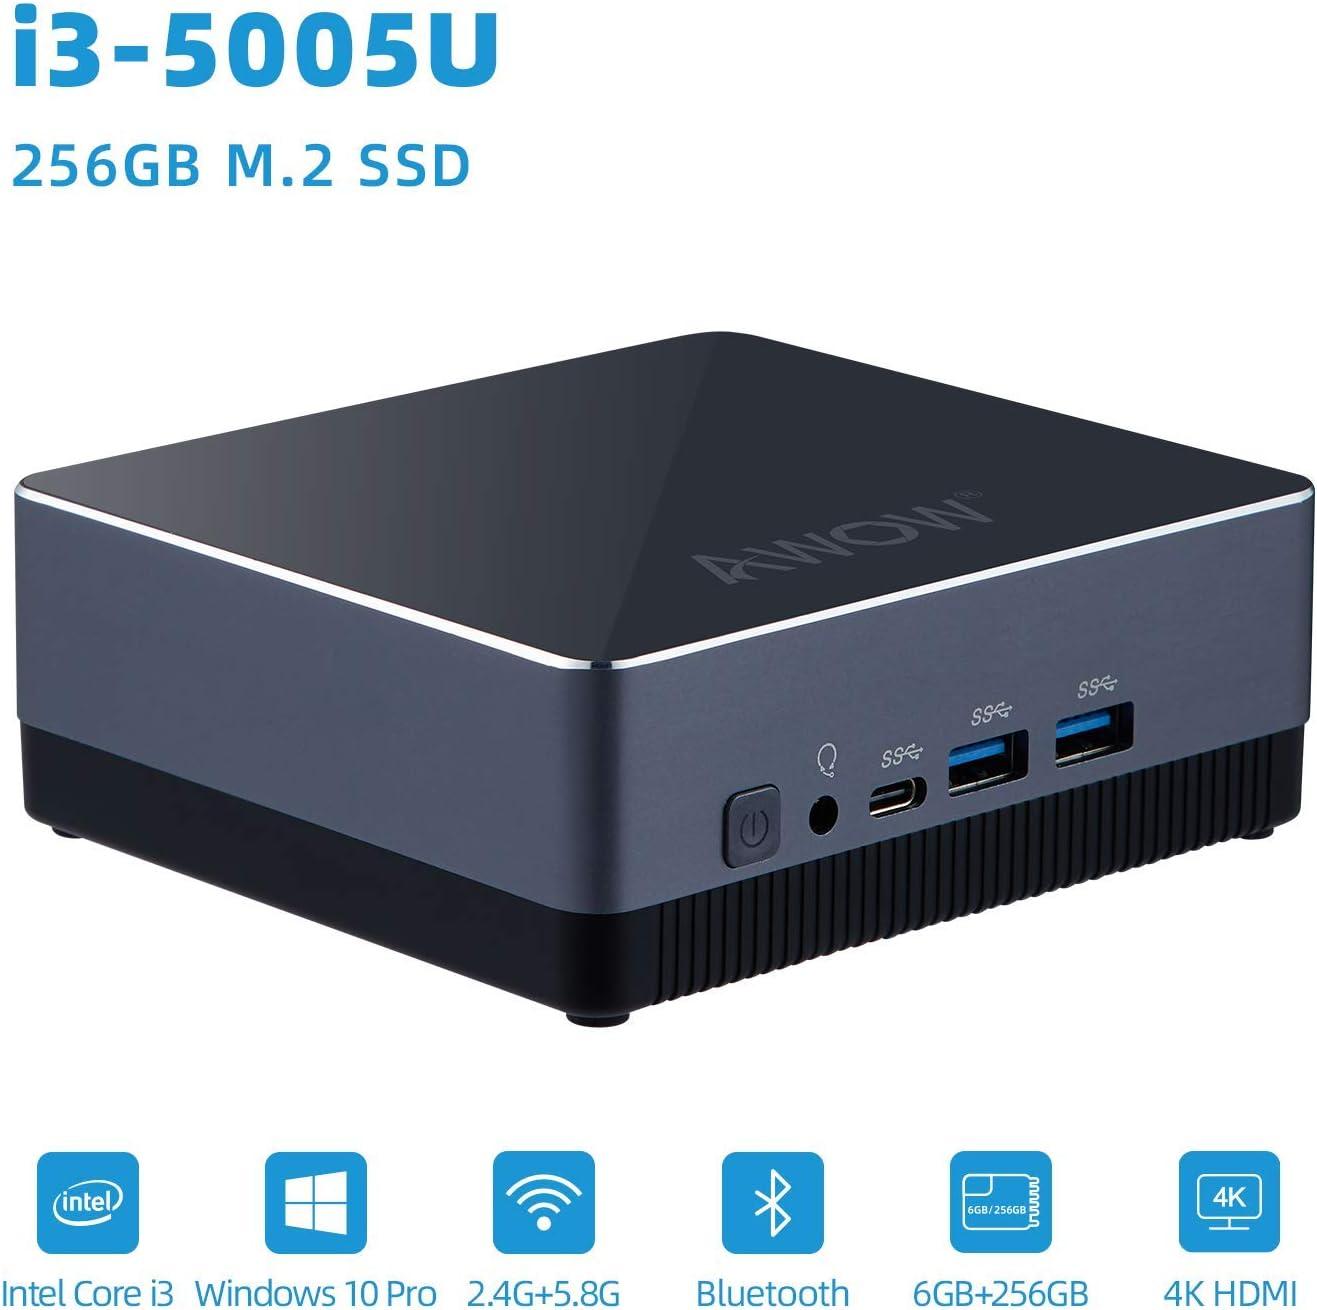 Mini PC Intel Core i3 5005U, 8GB DDR, 256GB M.2 SSD, Windows 10 Pro, Mini Desktop Computer AWOW NYi3 with 4K, Dual-Band Wi-Fi, Gigabit Ethernet, Dual HDMI, BT